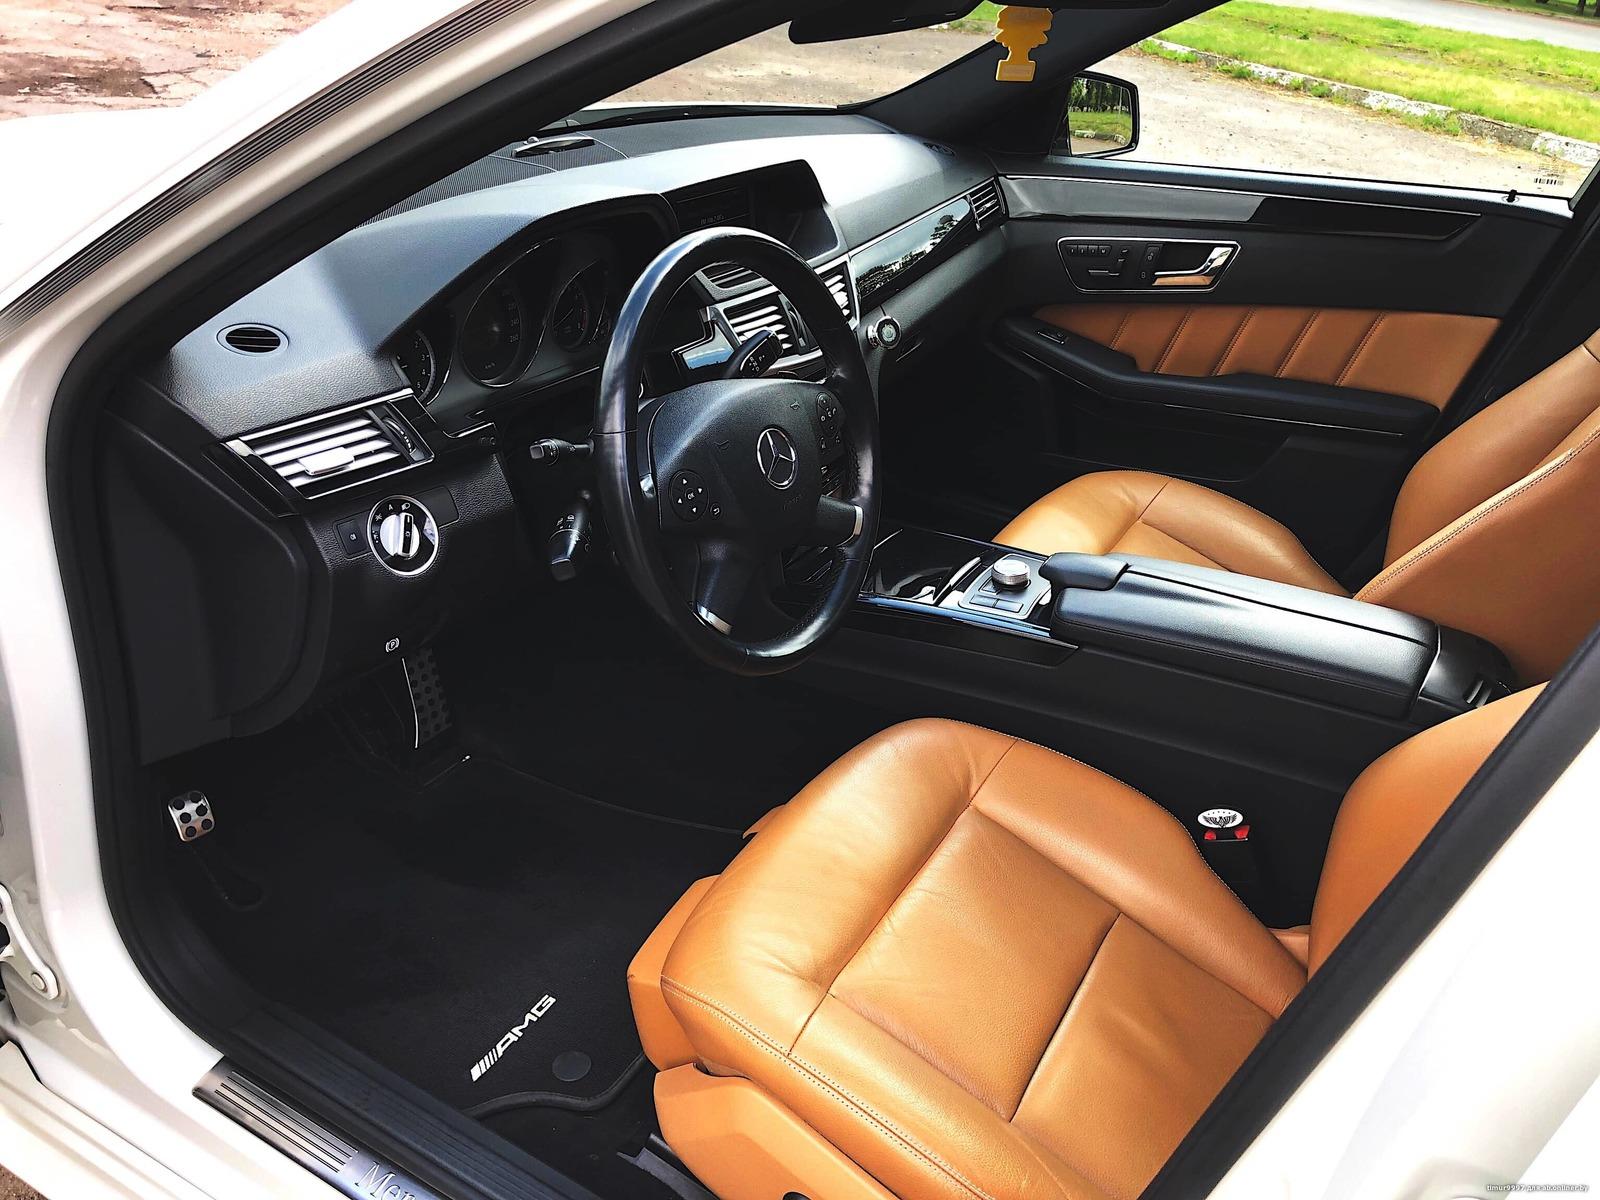 Mercedes-Benz E350 4Matic AMG Avangarde